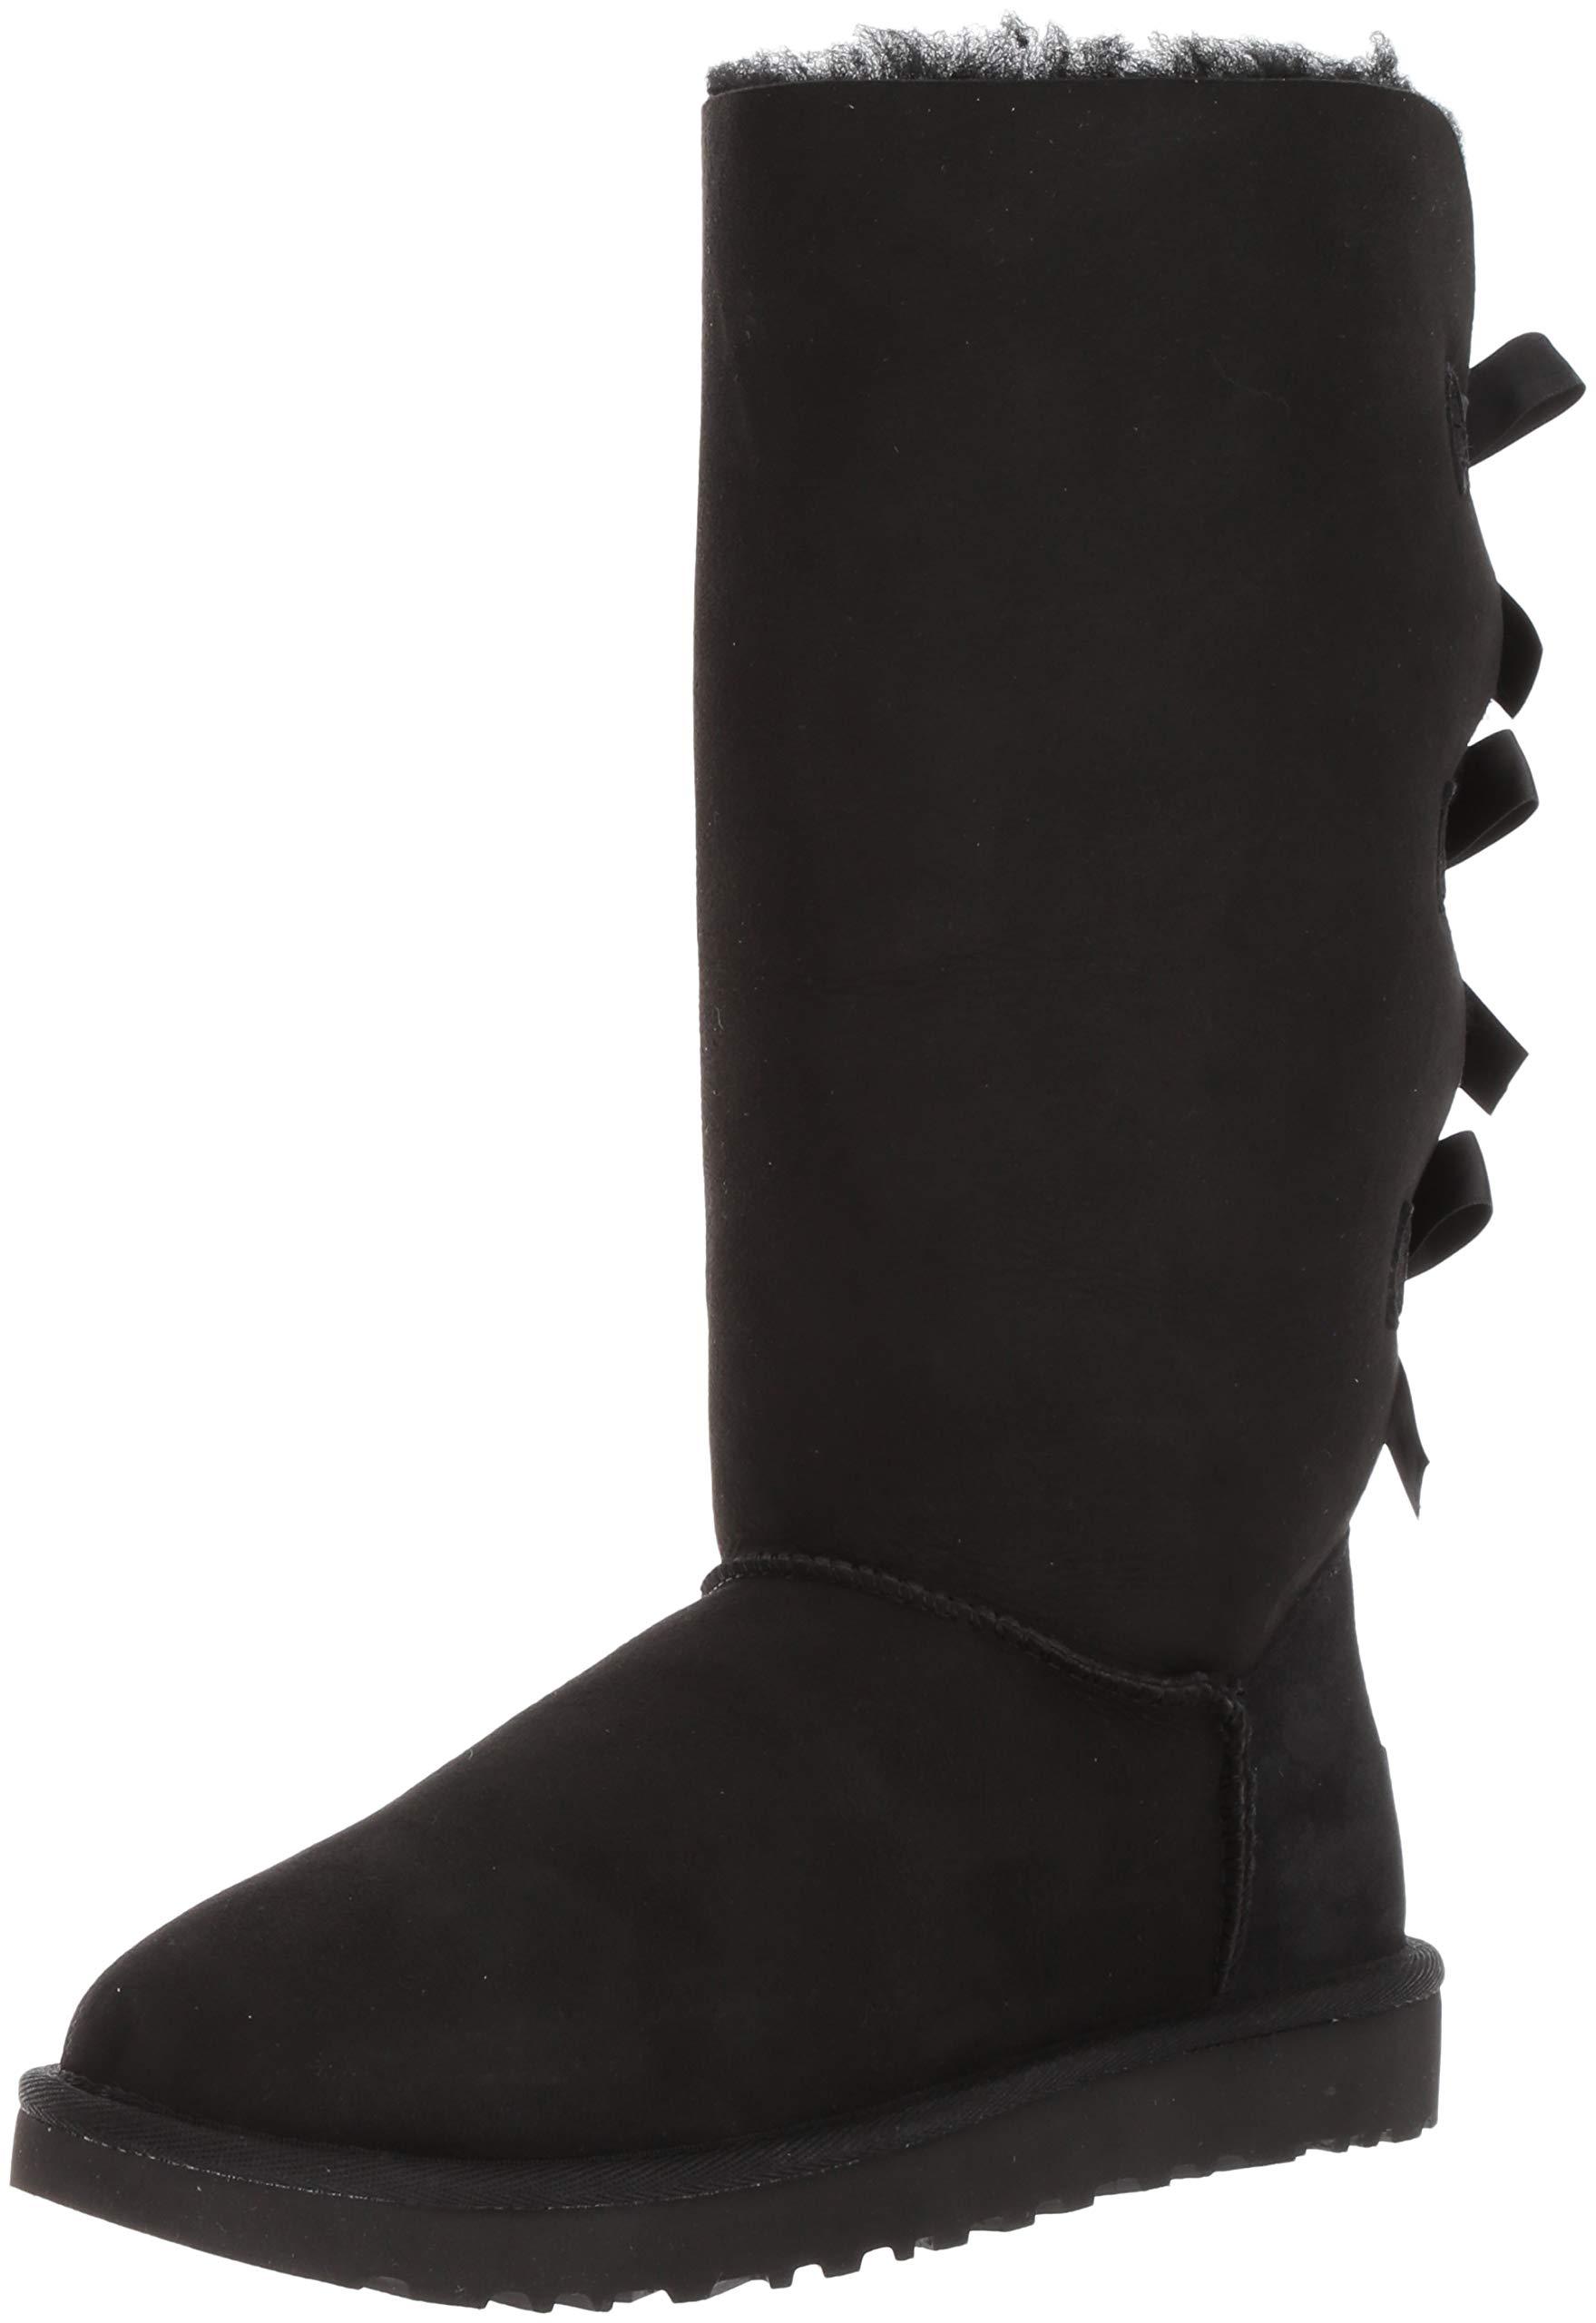 UGG Women's Bailey Bow Tall II, Black, 6 M US by UGG